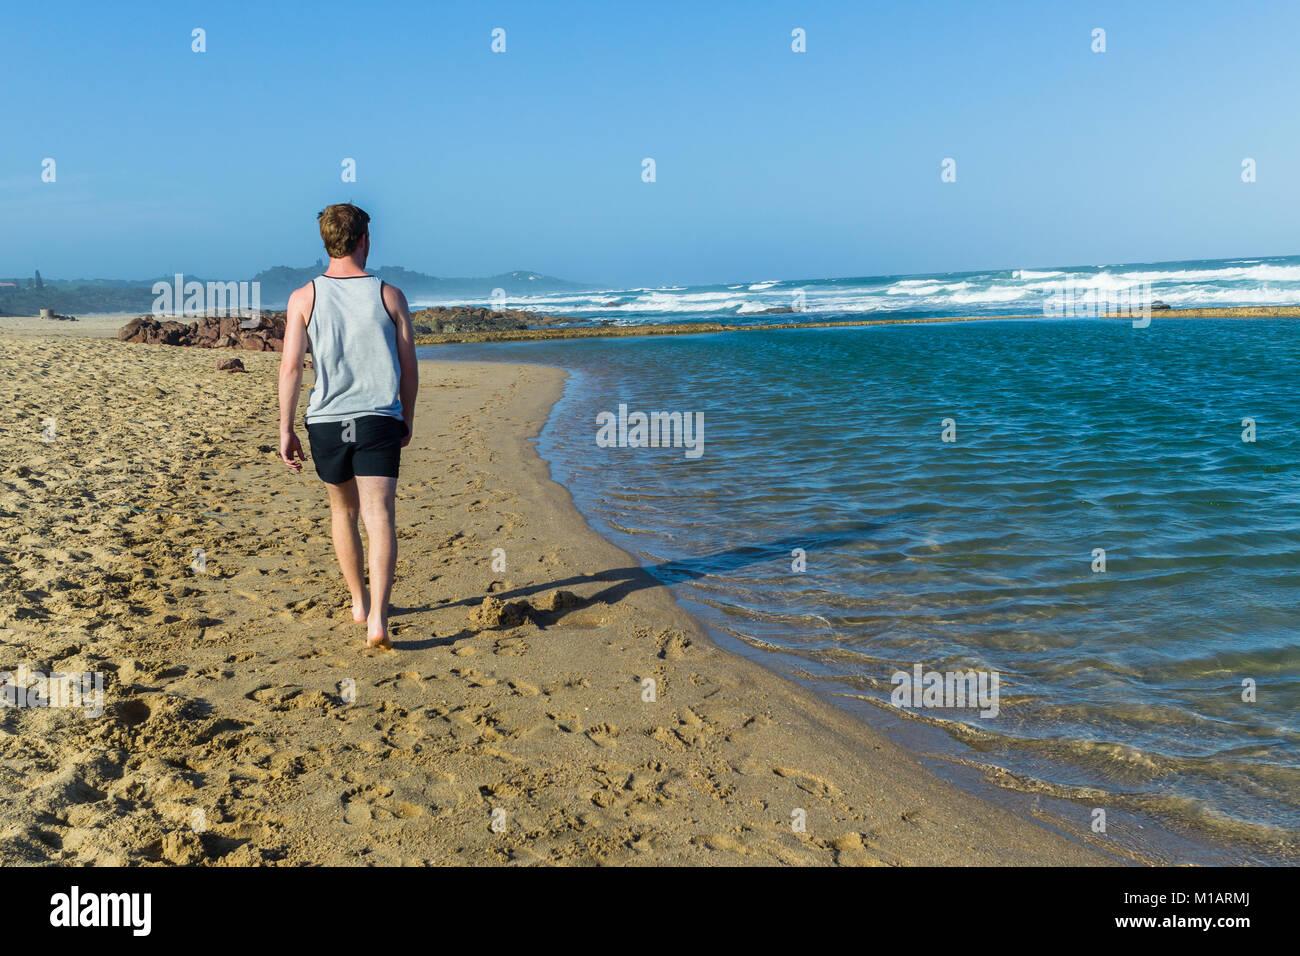 Tidal swimming pool stock photos tidal swimming pool stock images alamy for Waves swimming pool whitley bay